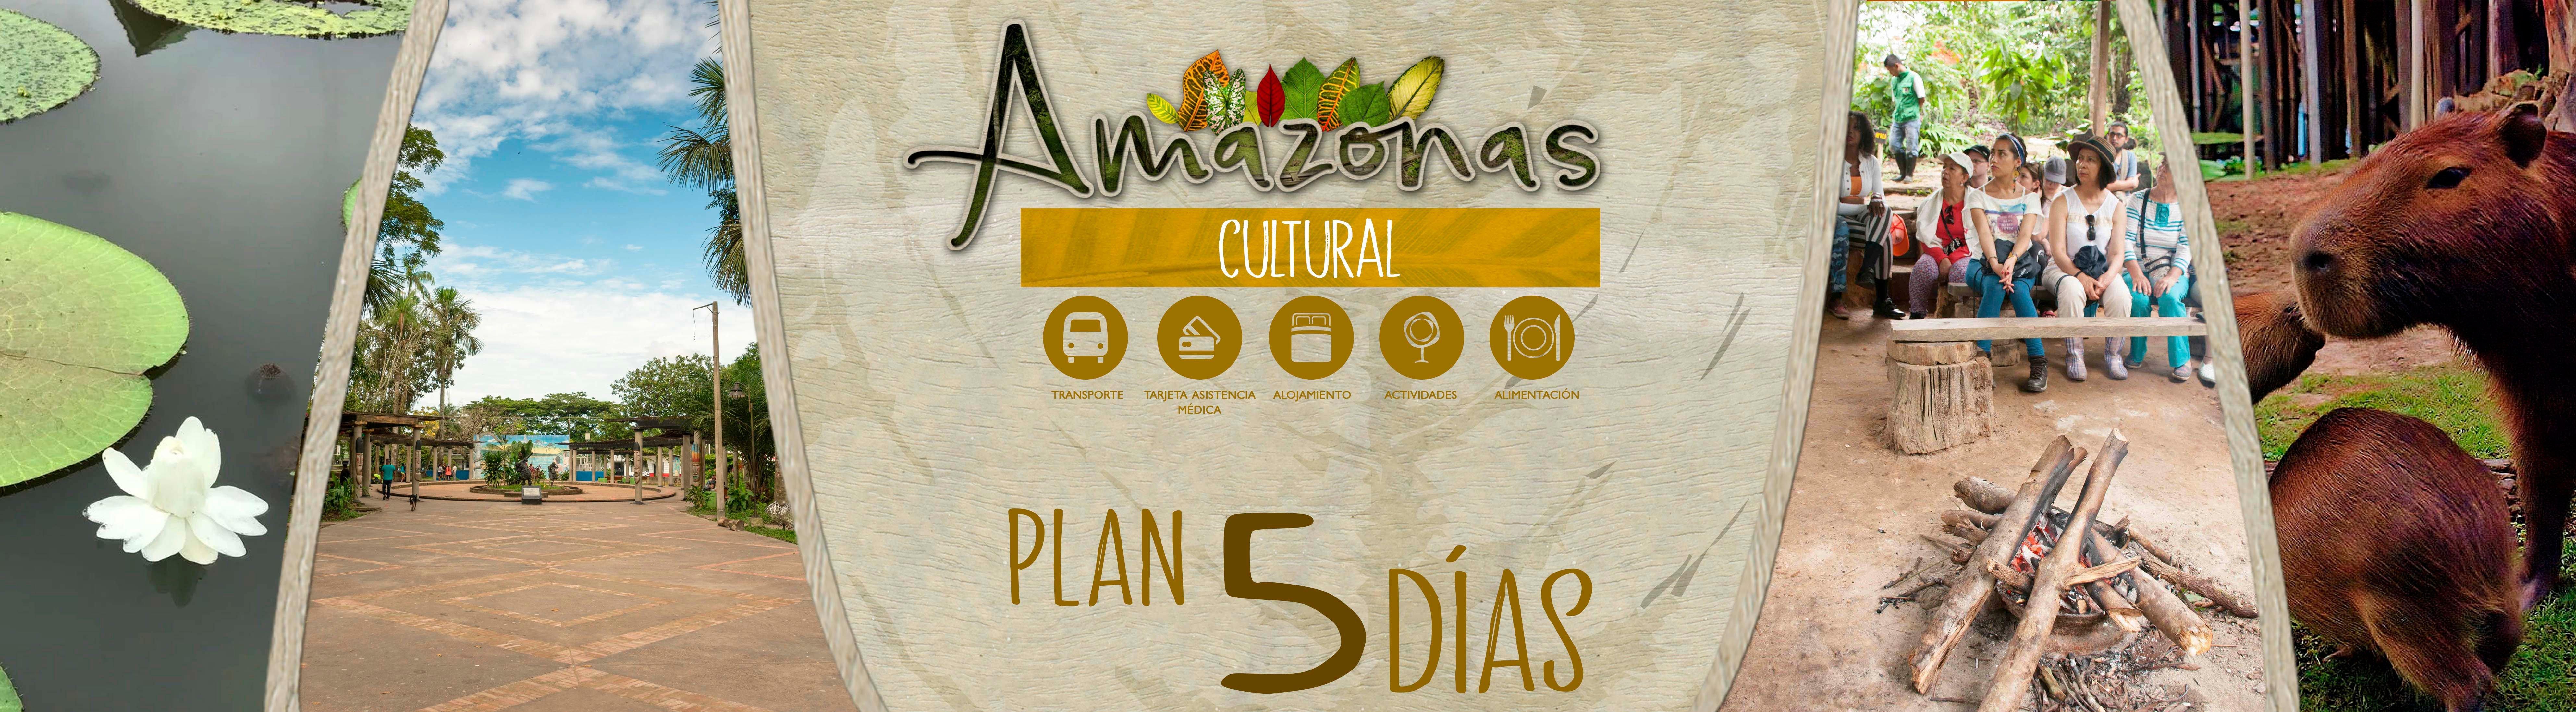 cultural 5 DIAS